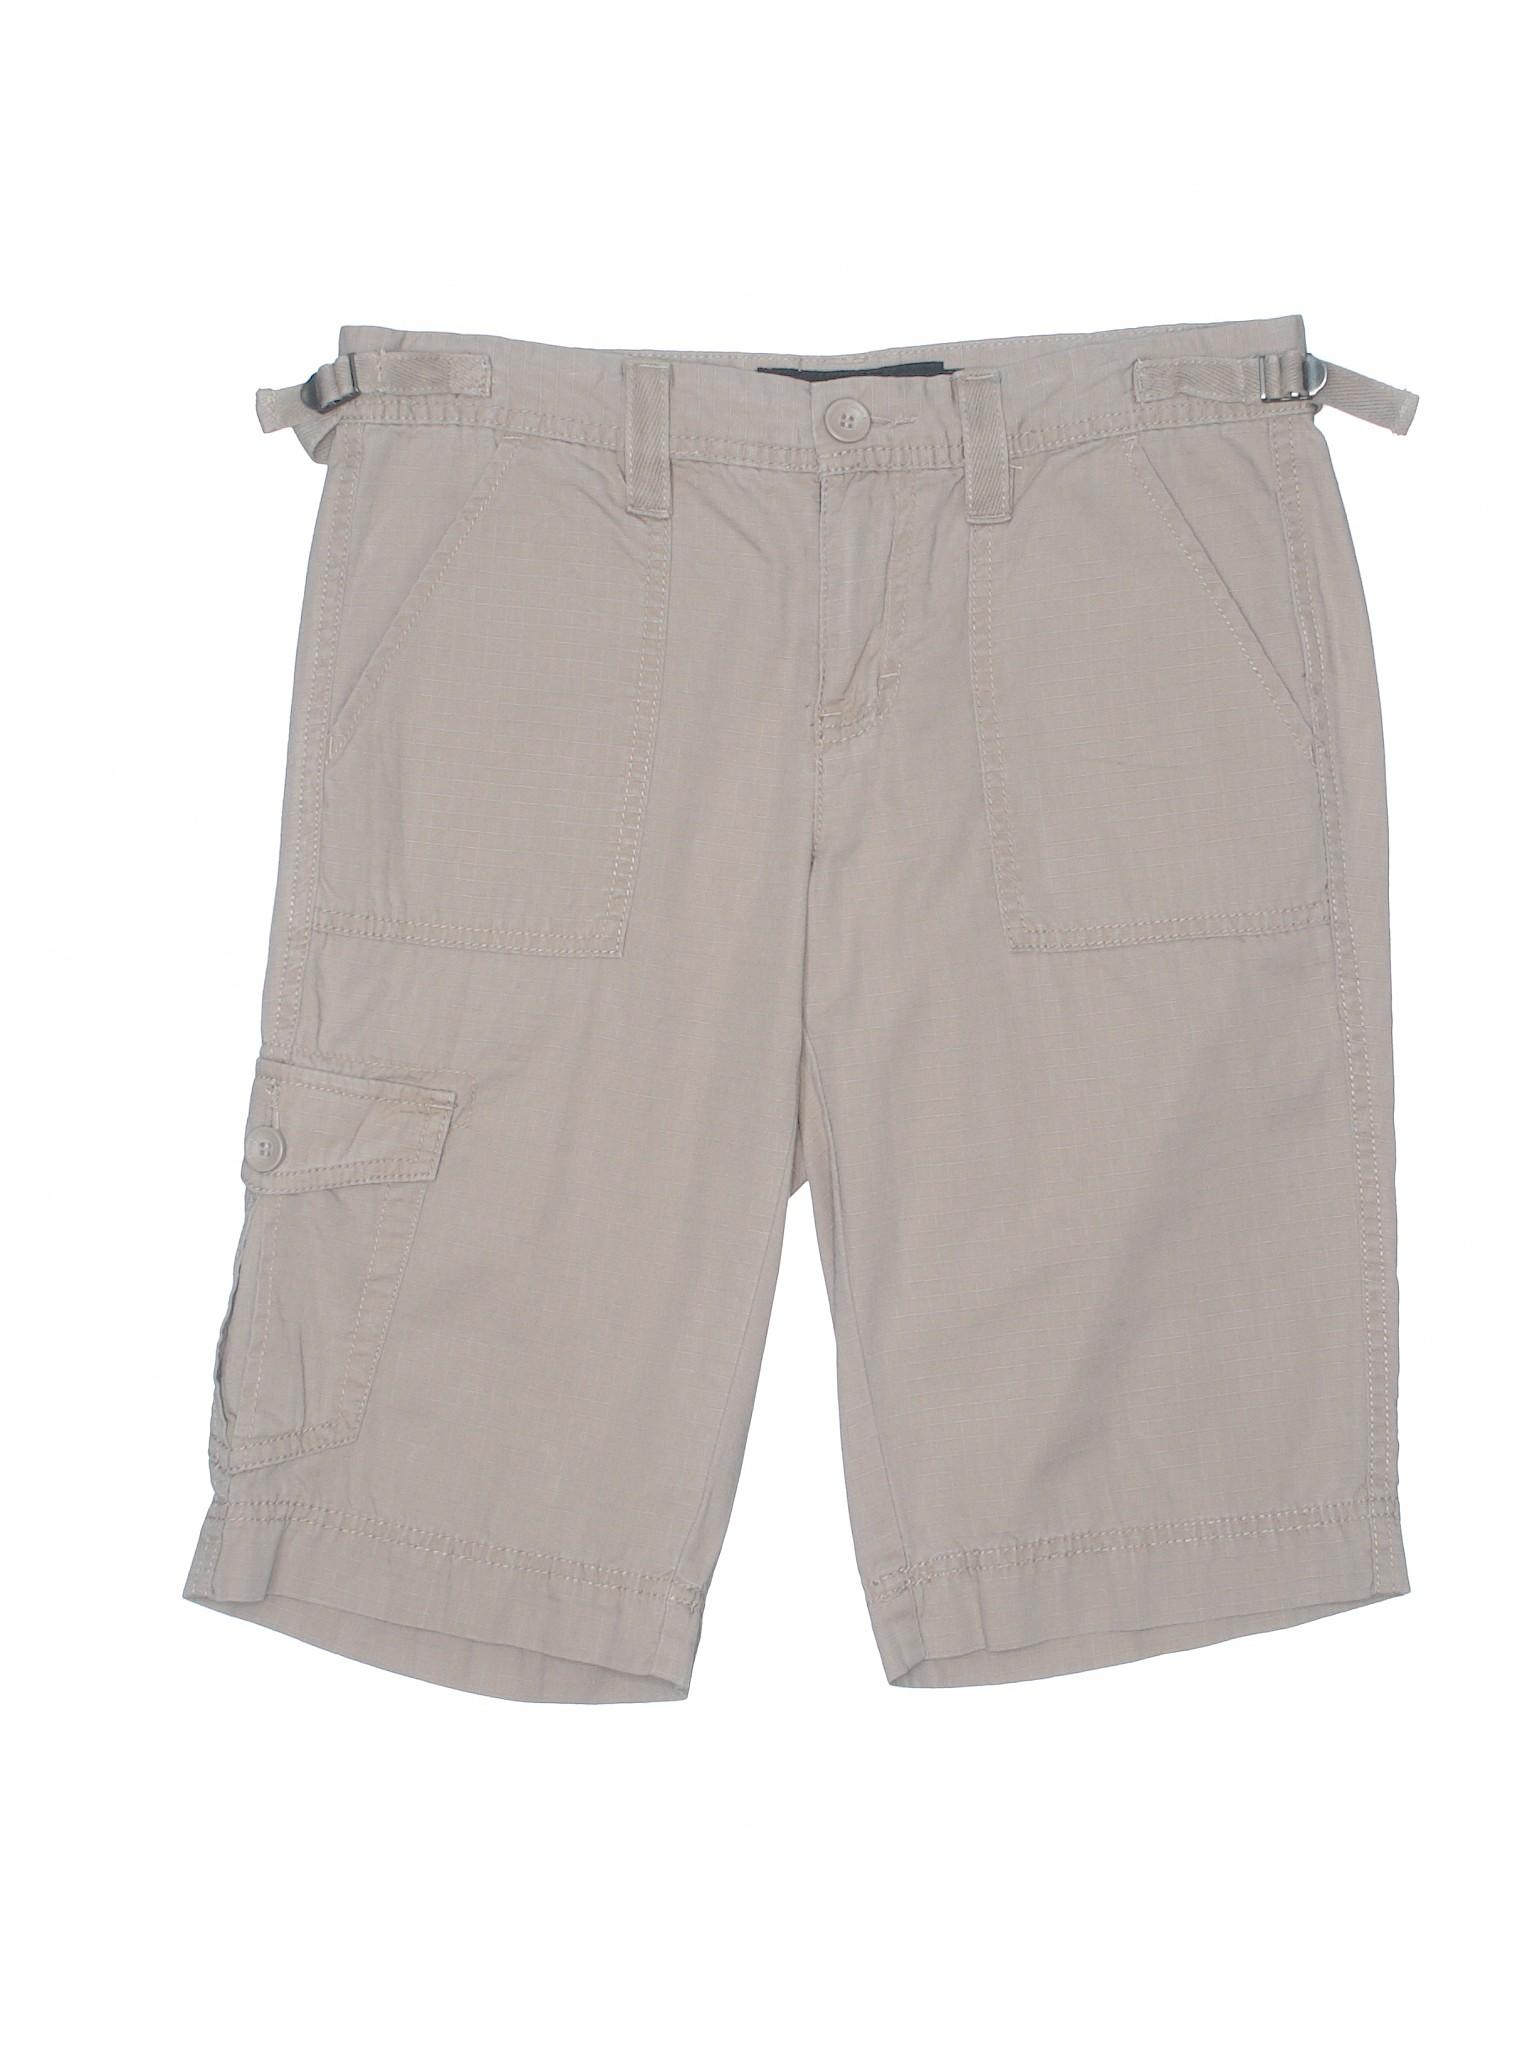 Shorts CALVIN Boutique KLEIN JEANS Cargo winter wXwYqgz